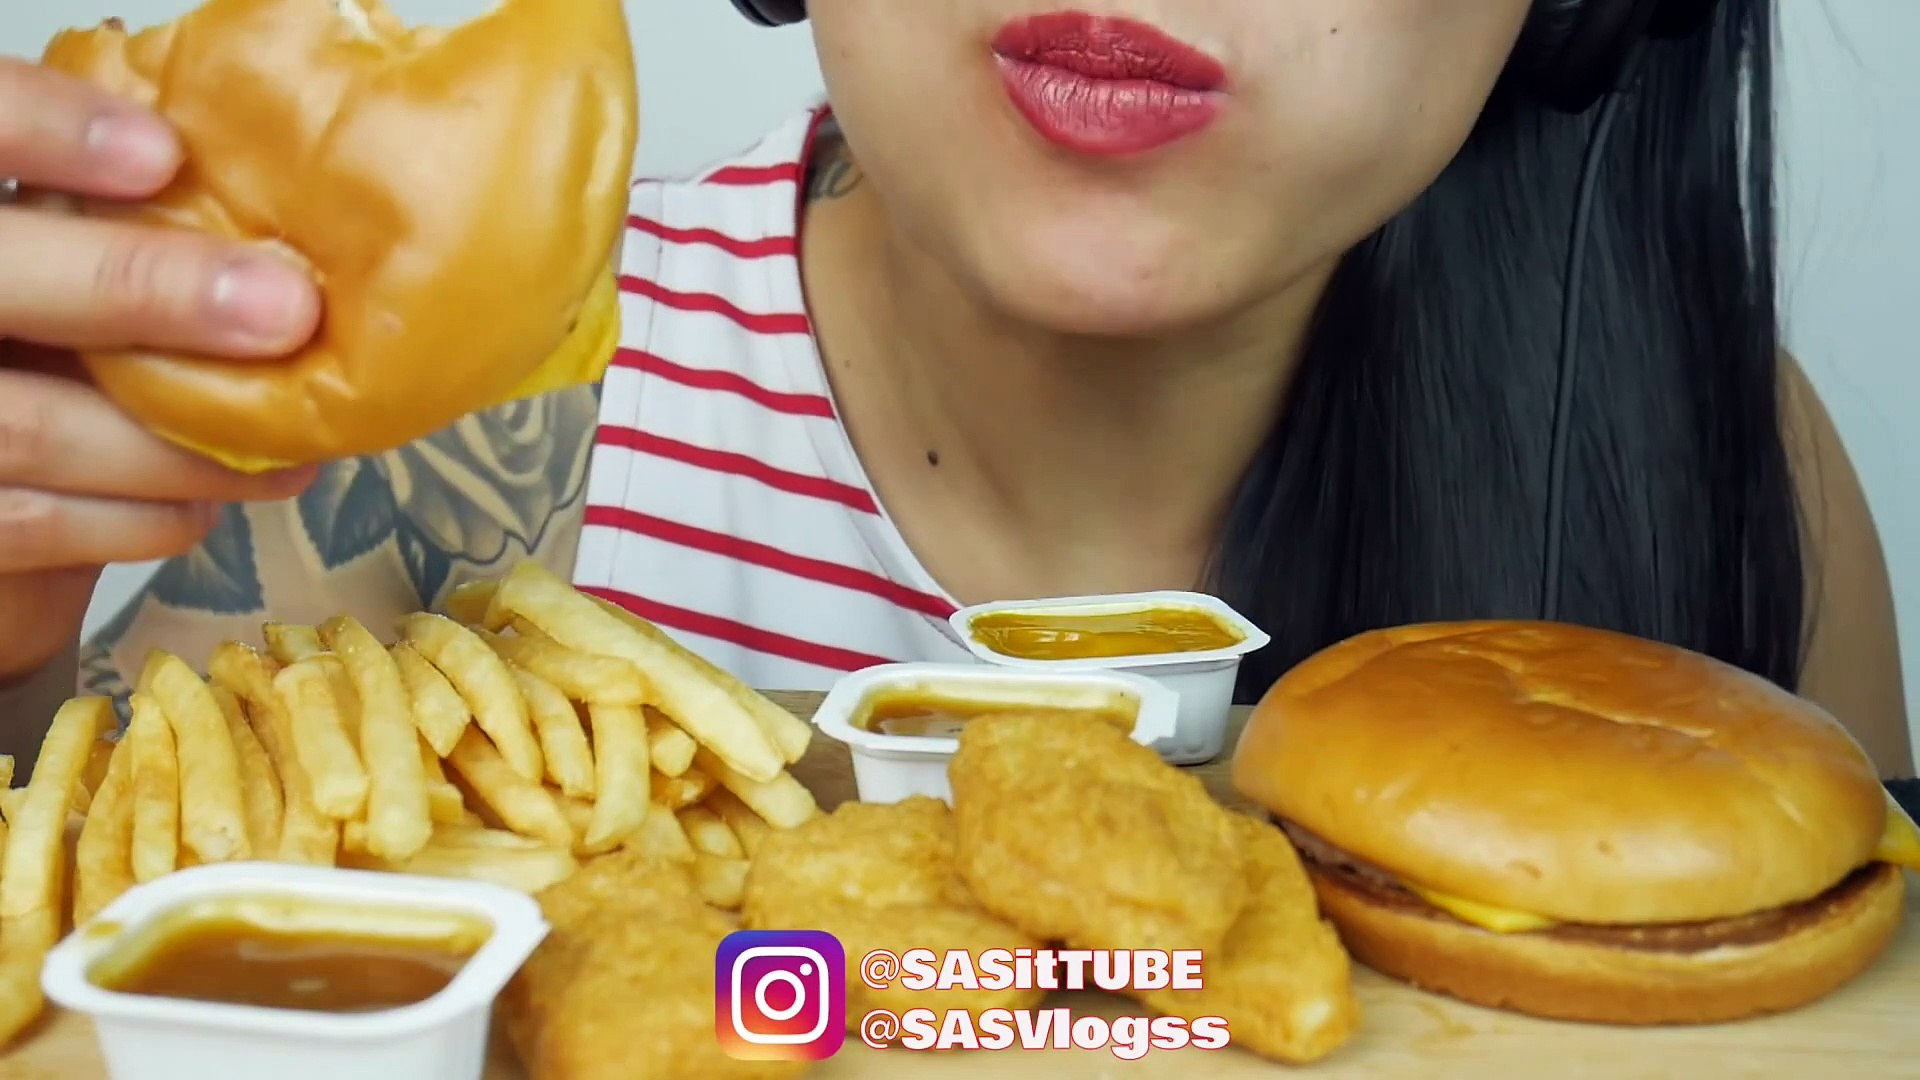 Asmr Mcdonalds Chicken Nuggets Cheeseburger Eating Sounds Sas Asmr Video Dailymotion Perfect crunchy fried chicken *recipe   sasvlogs. asmr mcdonalds chicken nuggets cheeseburger eating sounds sas asmr